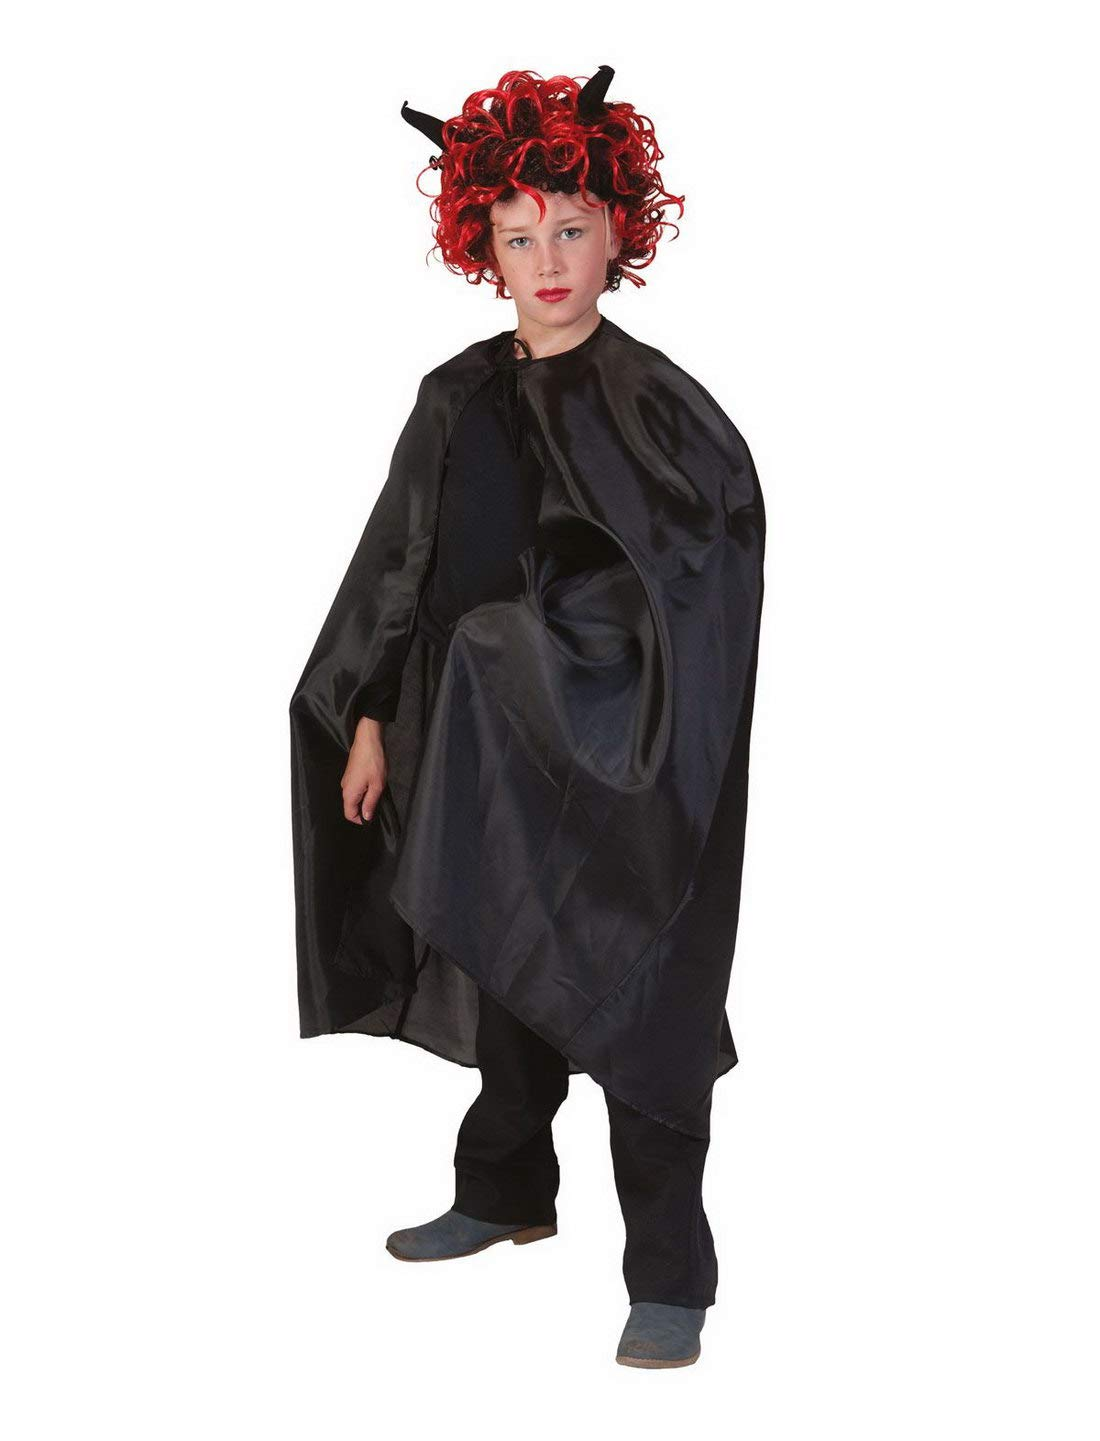 costumebakery - Disfraz Infantil Teufel Vampiro Drácula Capa, Cape ...